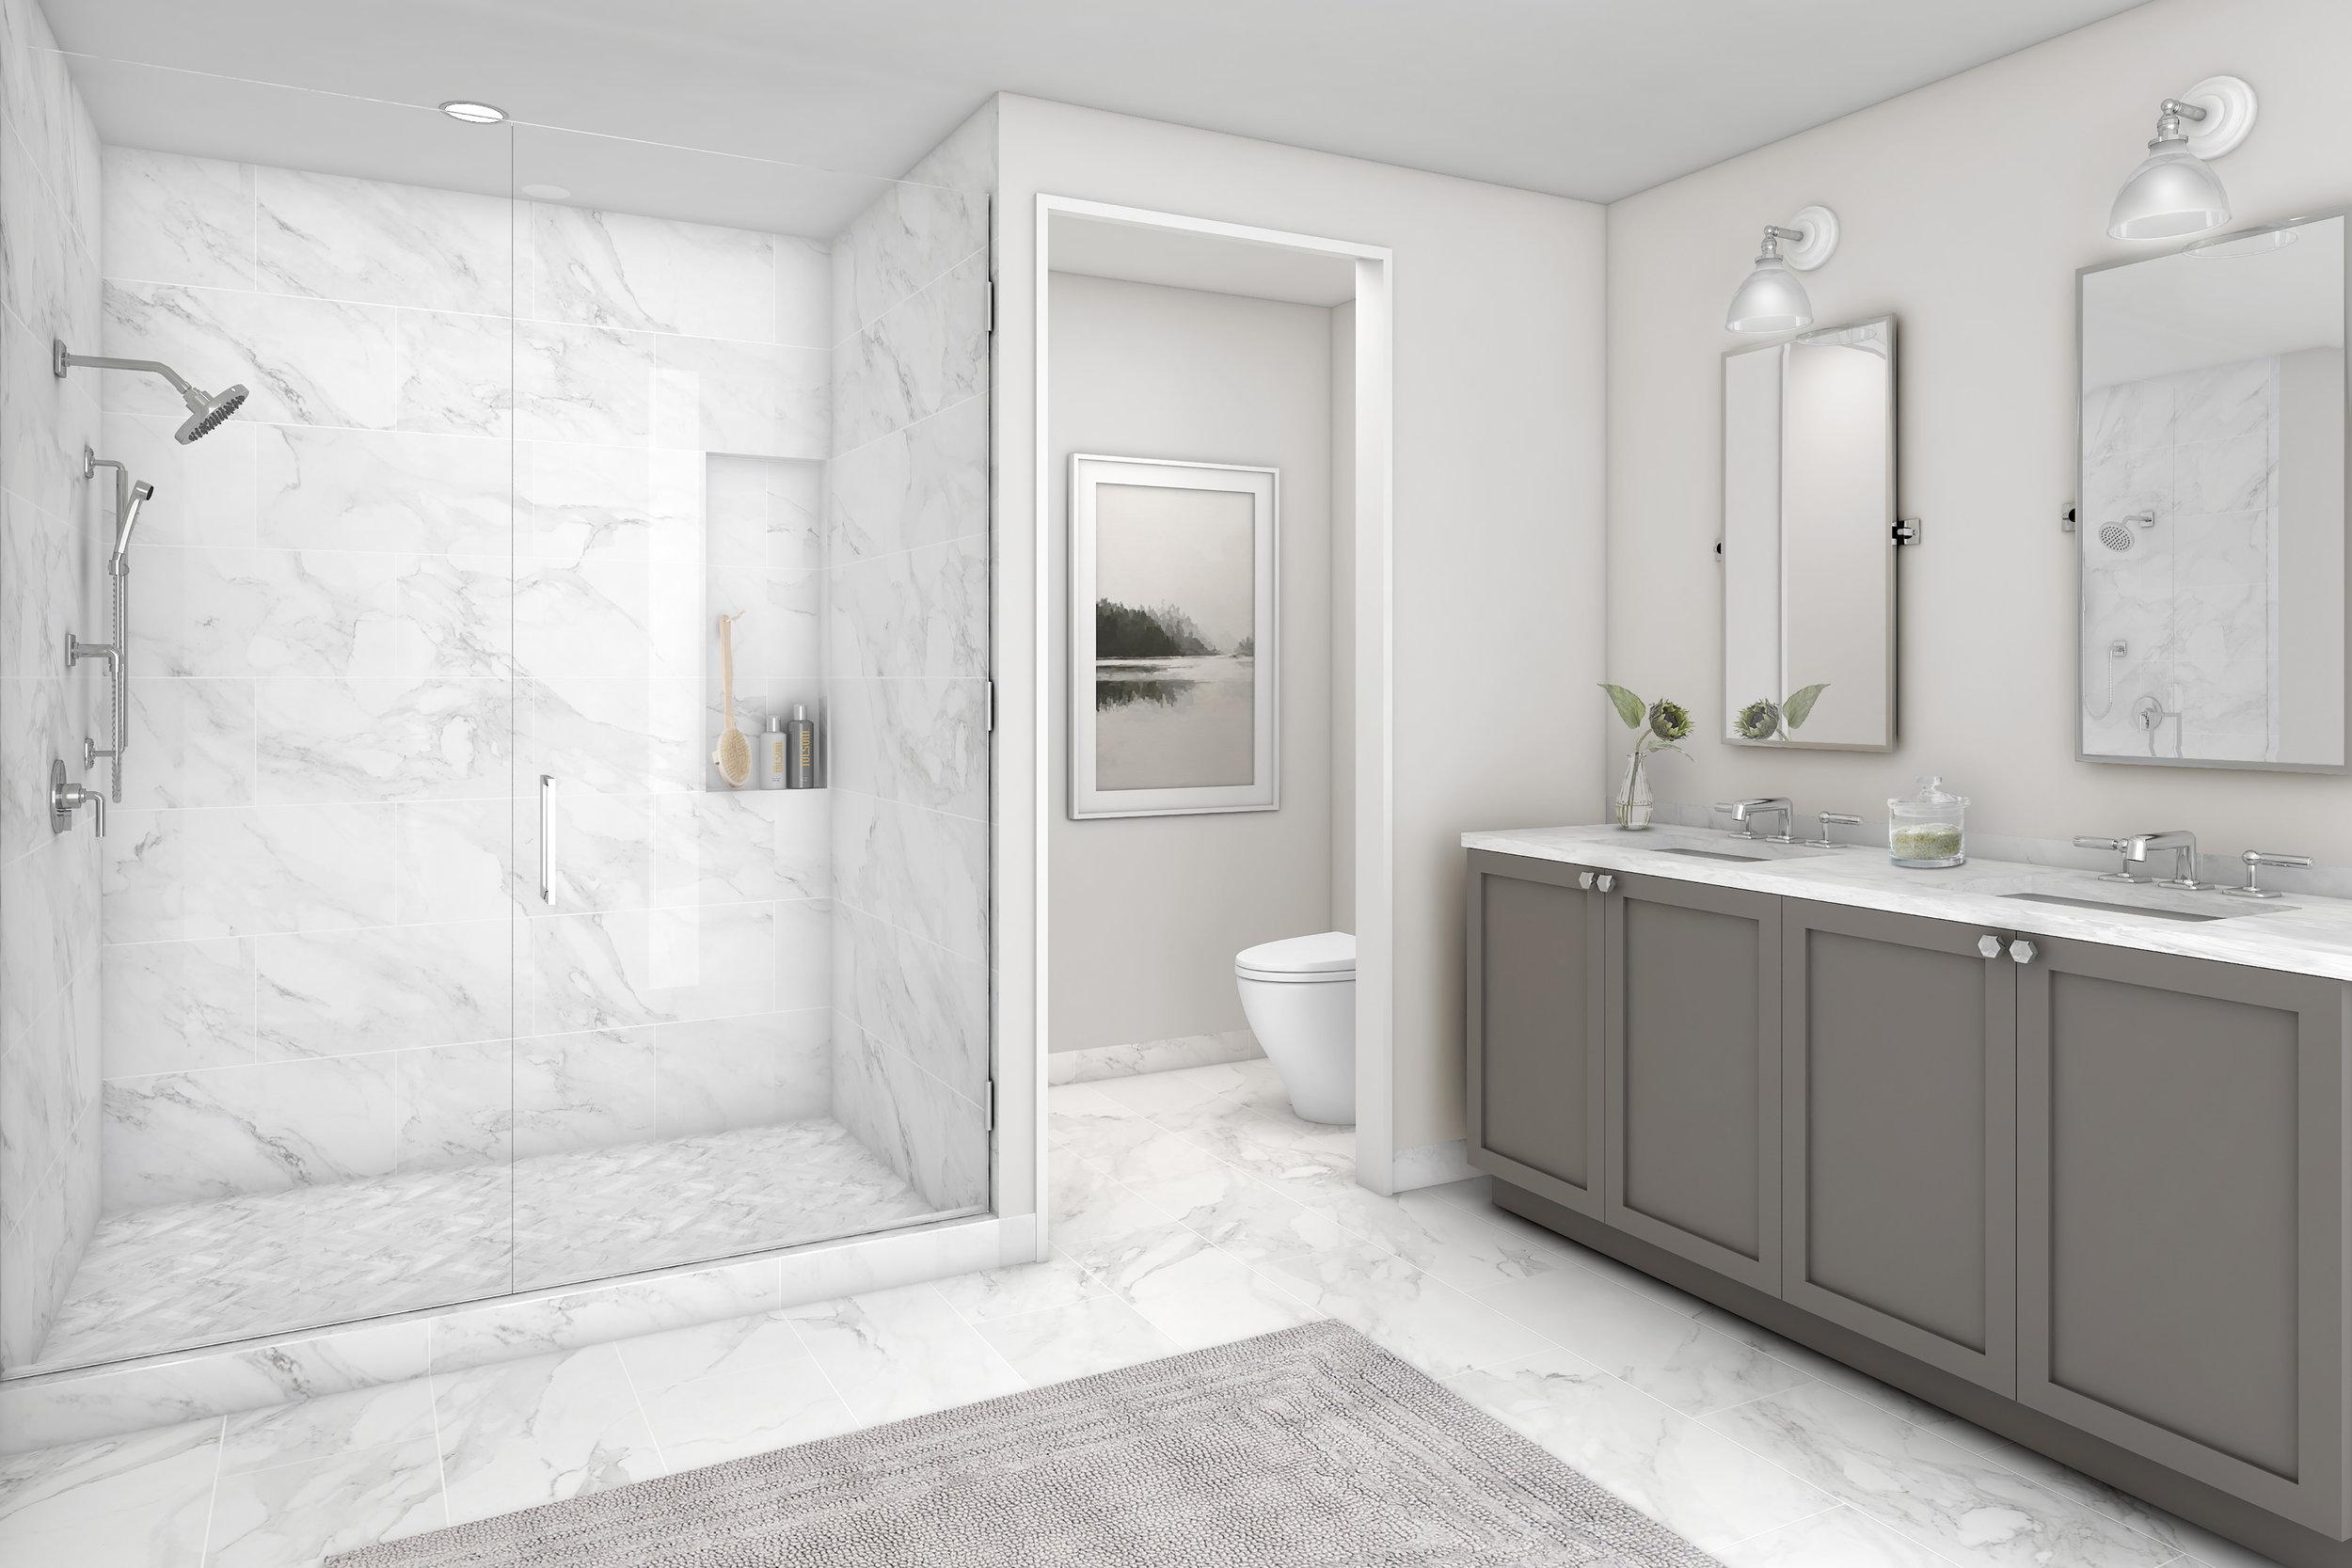 07 Unit 404 Bathroom 2018.jpg